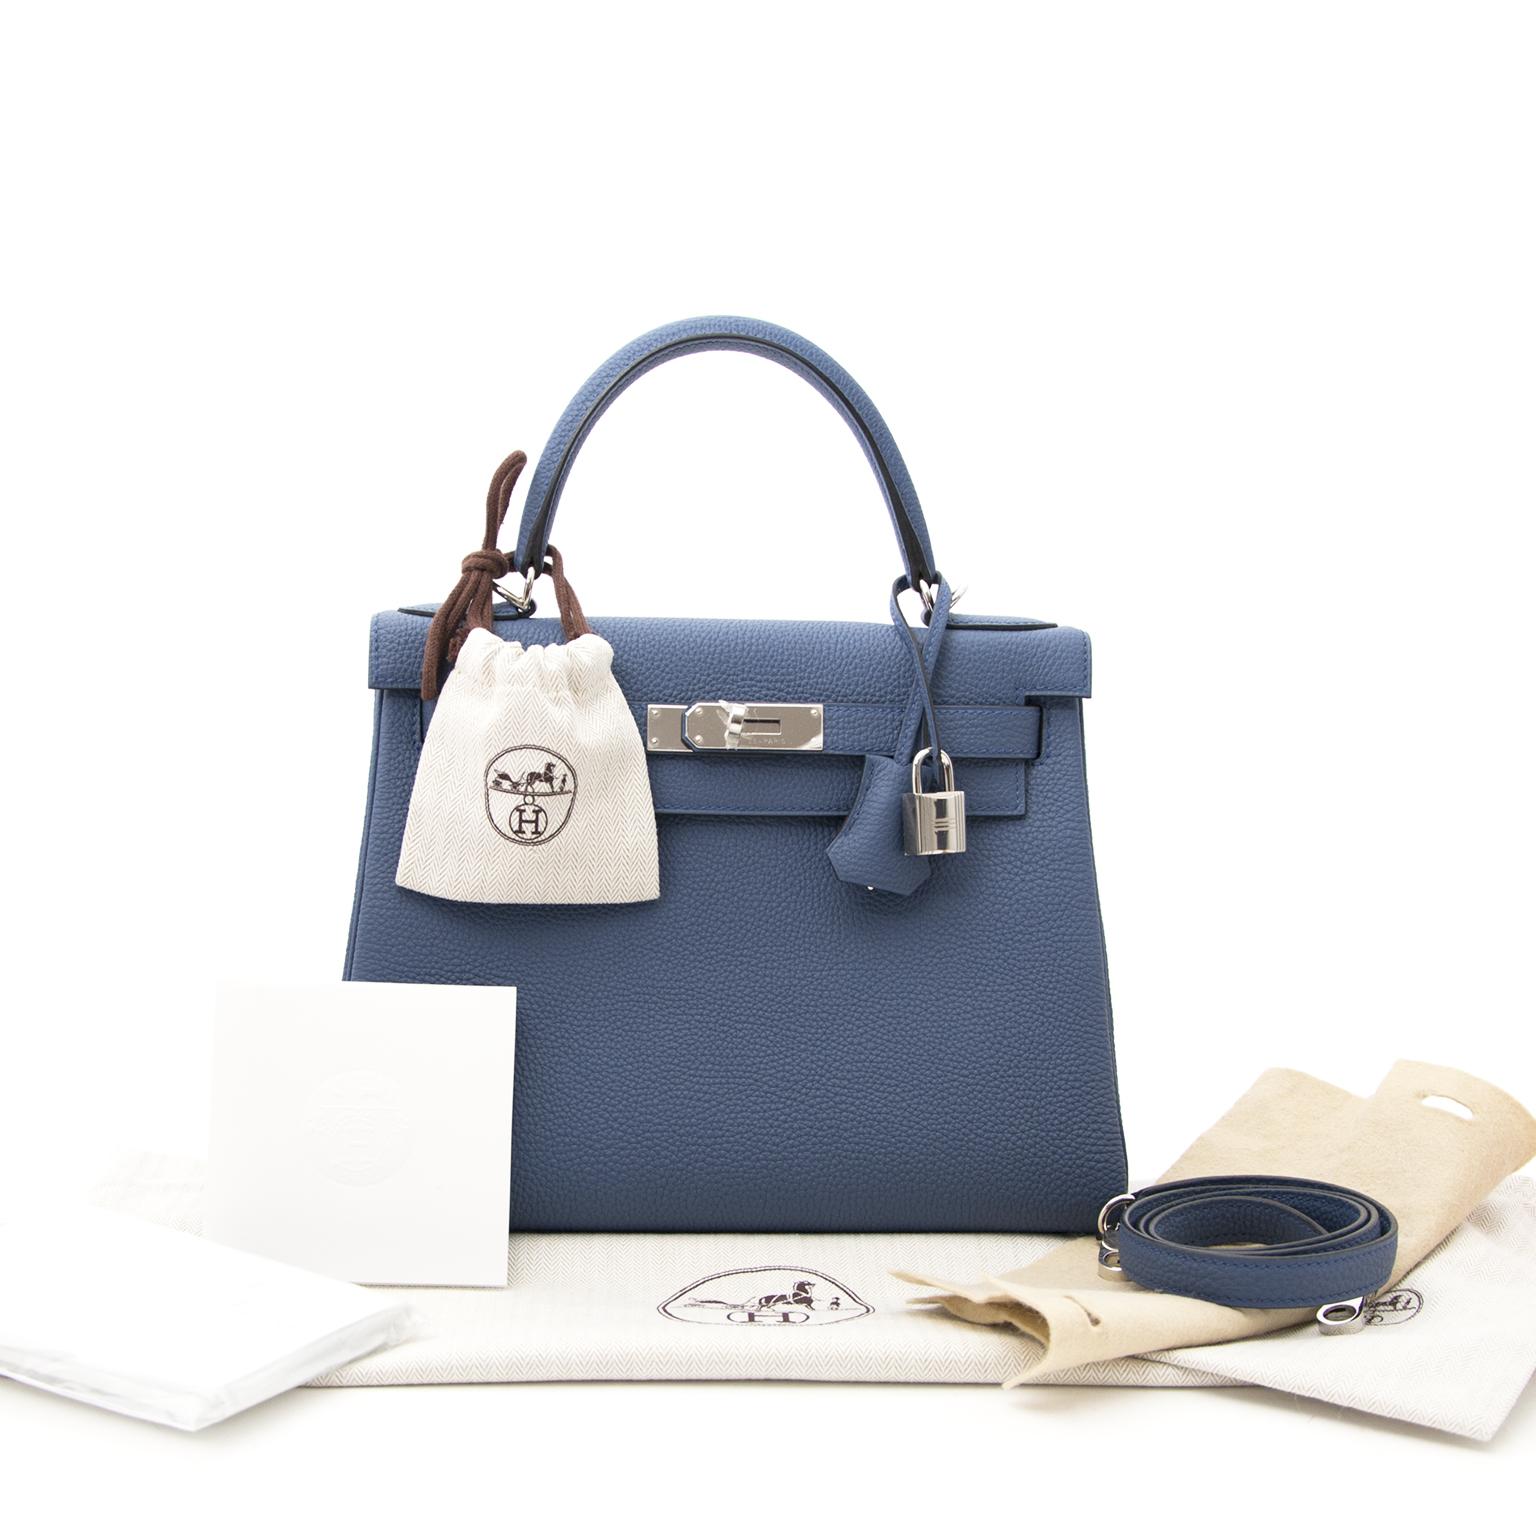 3f7018bf835 ... shop safe online your secondhand Brand New Hermes Kelly 28 Bleu Agate Togo  PHW